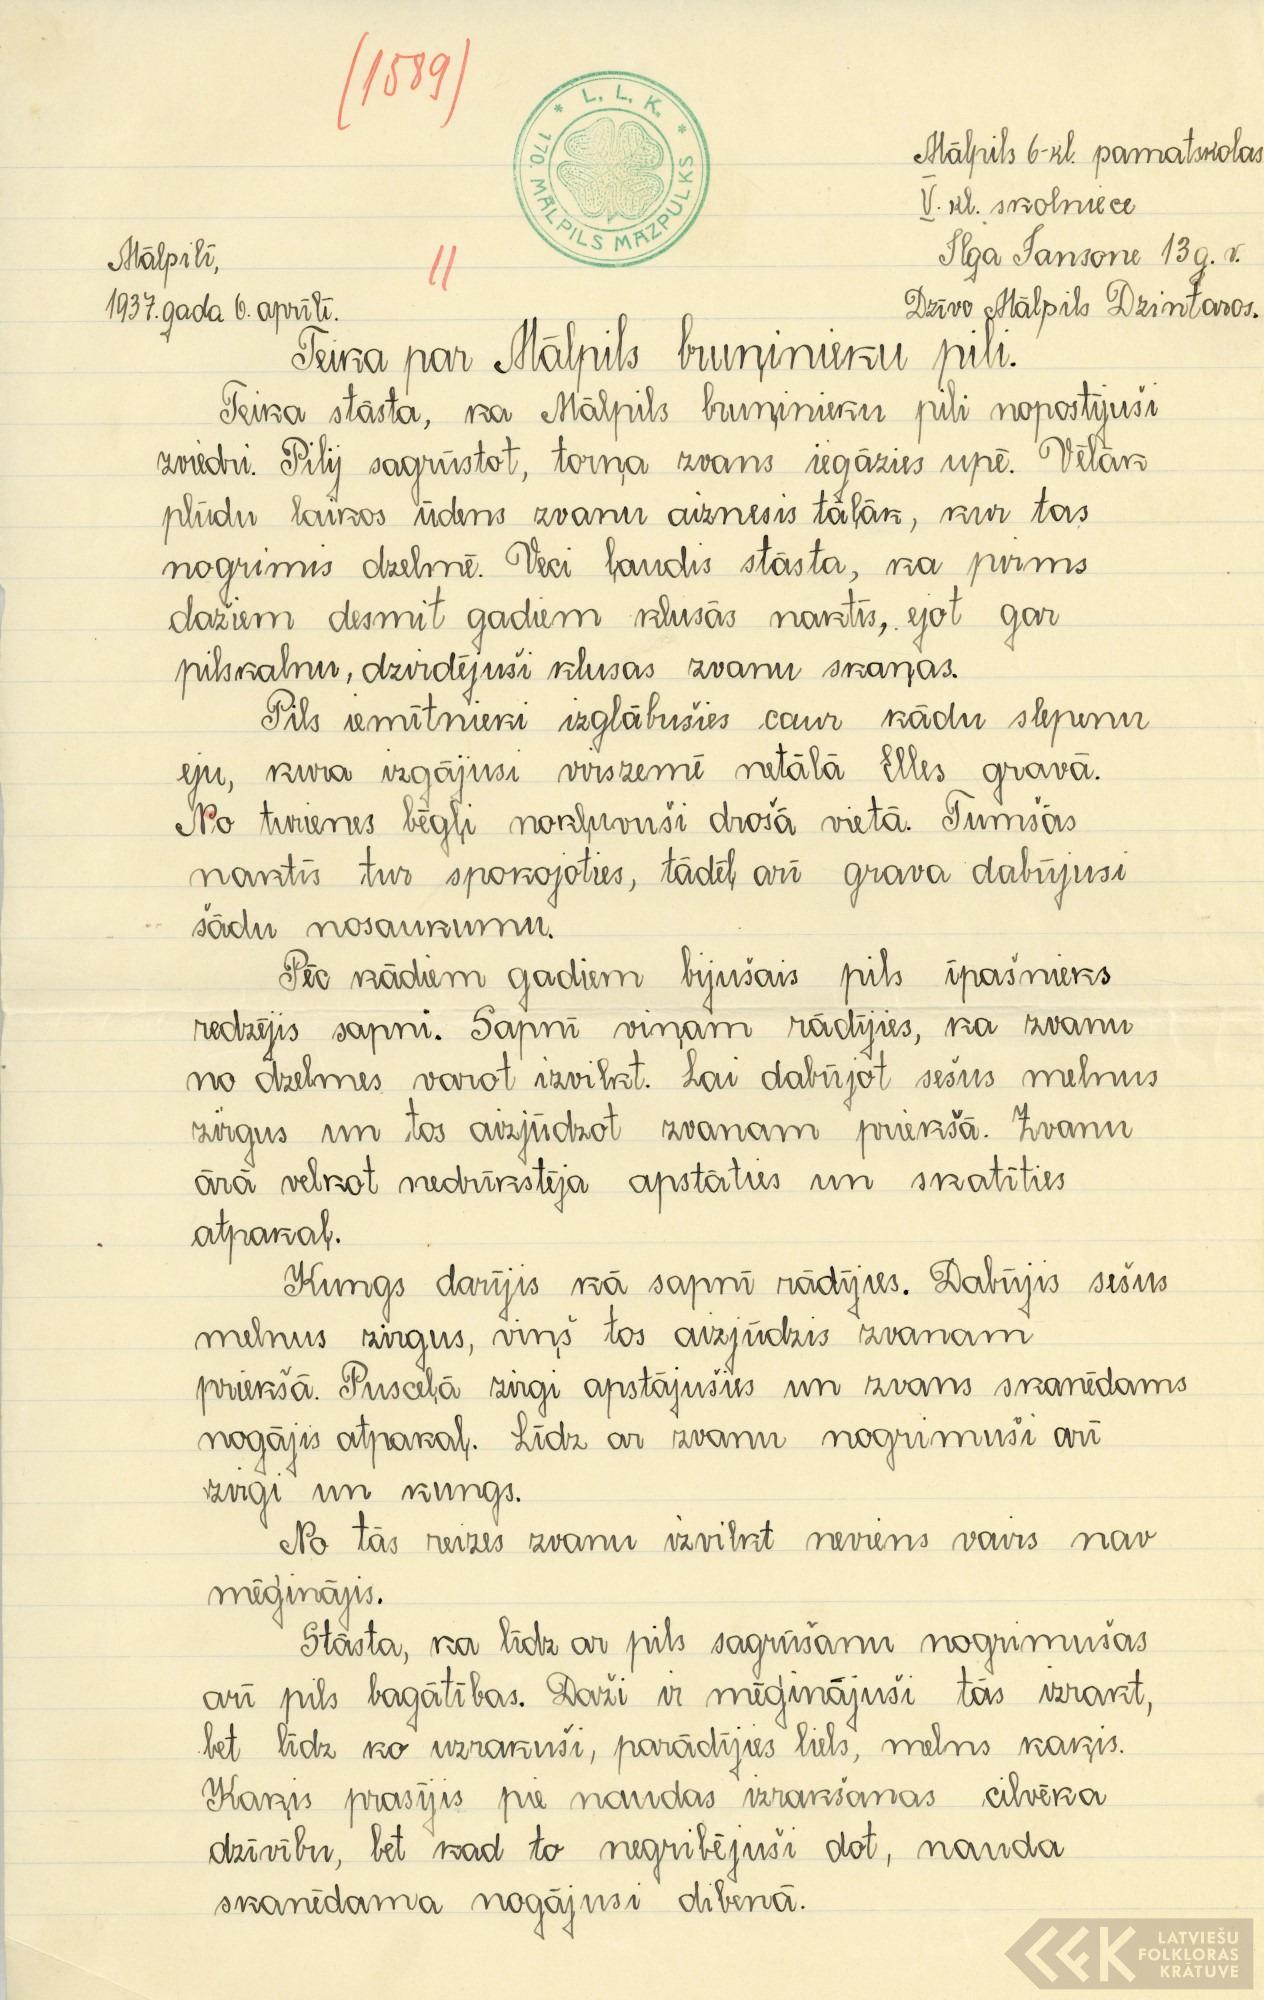 1589-Malpils-mazpulks-01-0016